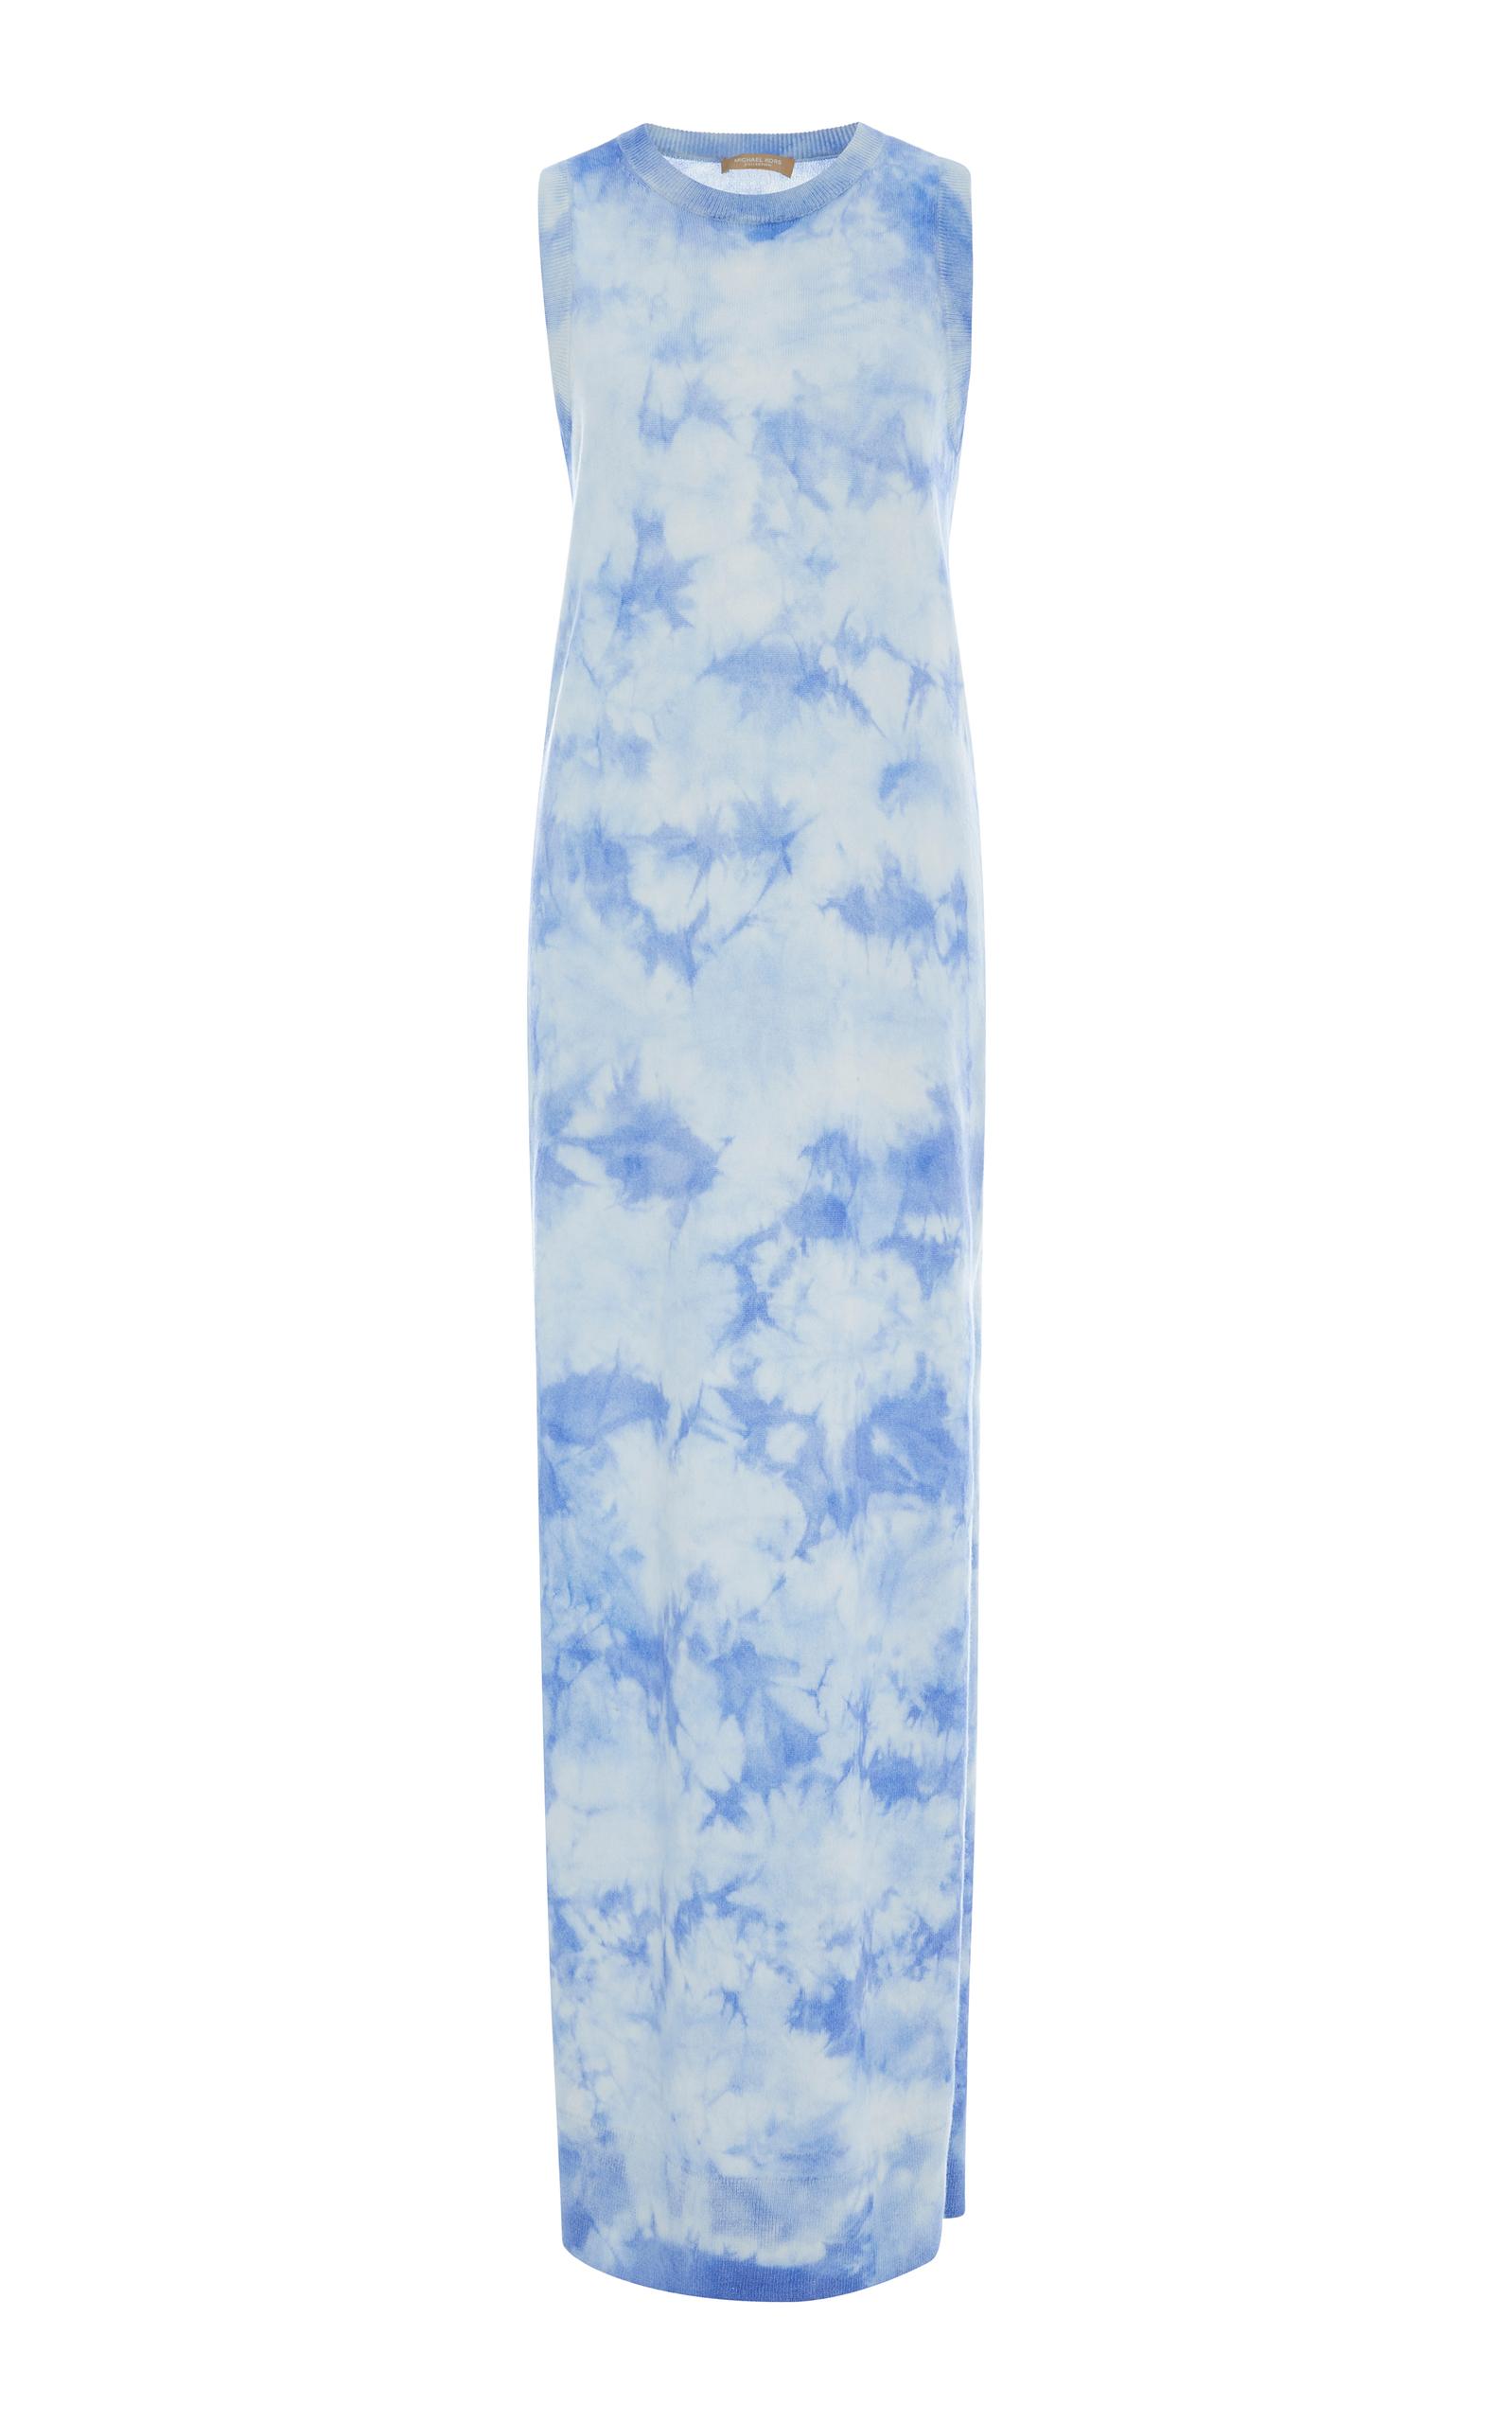 Michael Kors Sleeveless Crewneck Tie Dye Maxi Dress In Blue